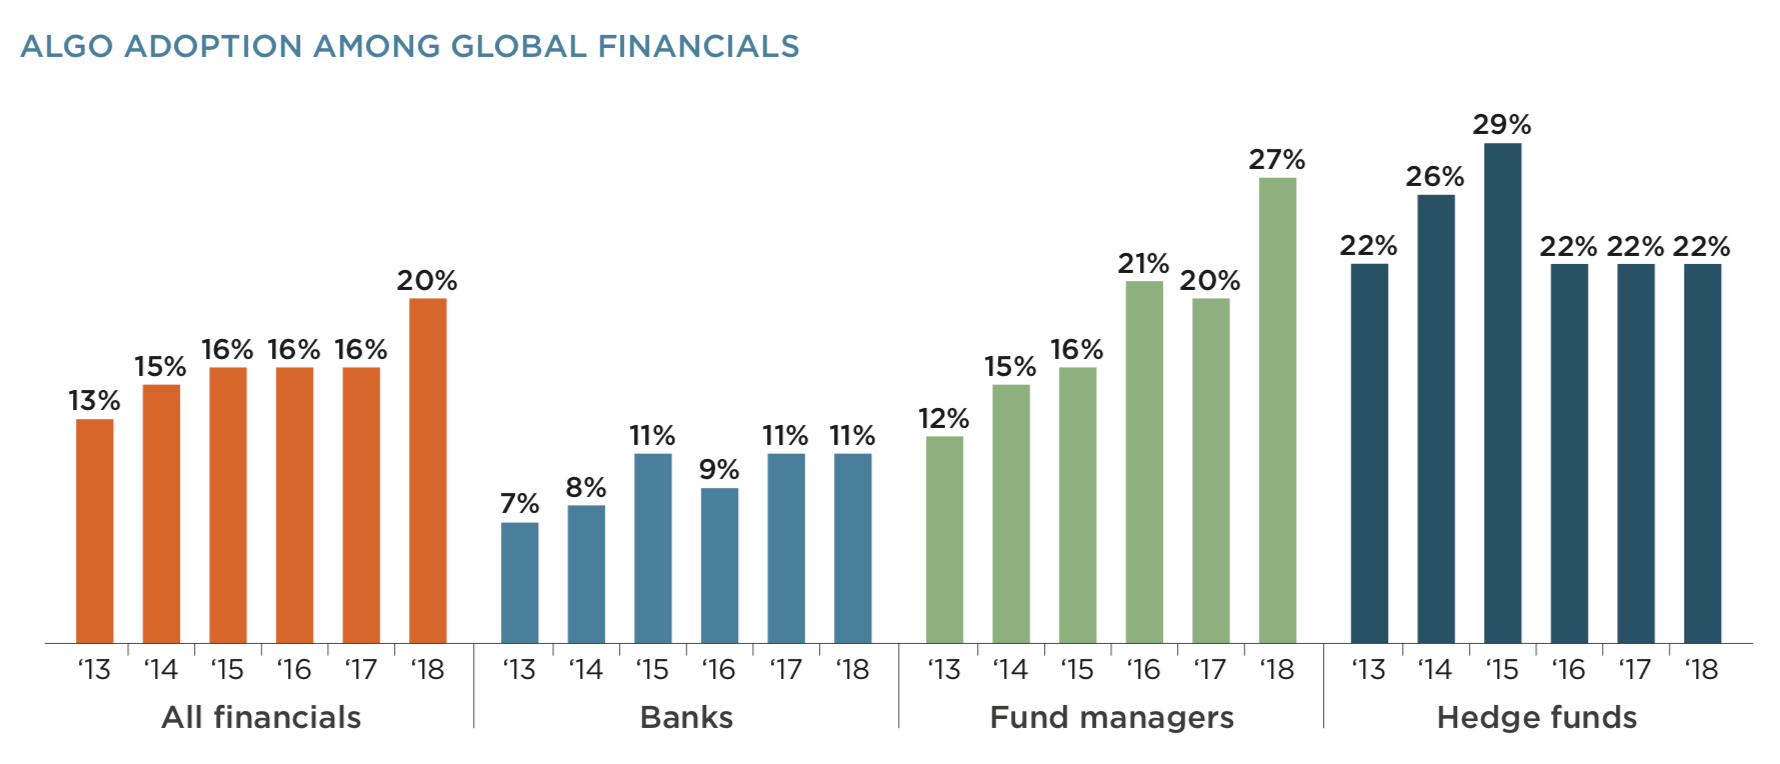 ALGO ADOPTION AMONG GLOBAL FINANCIALS